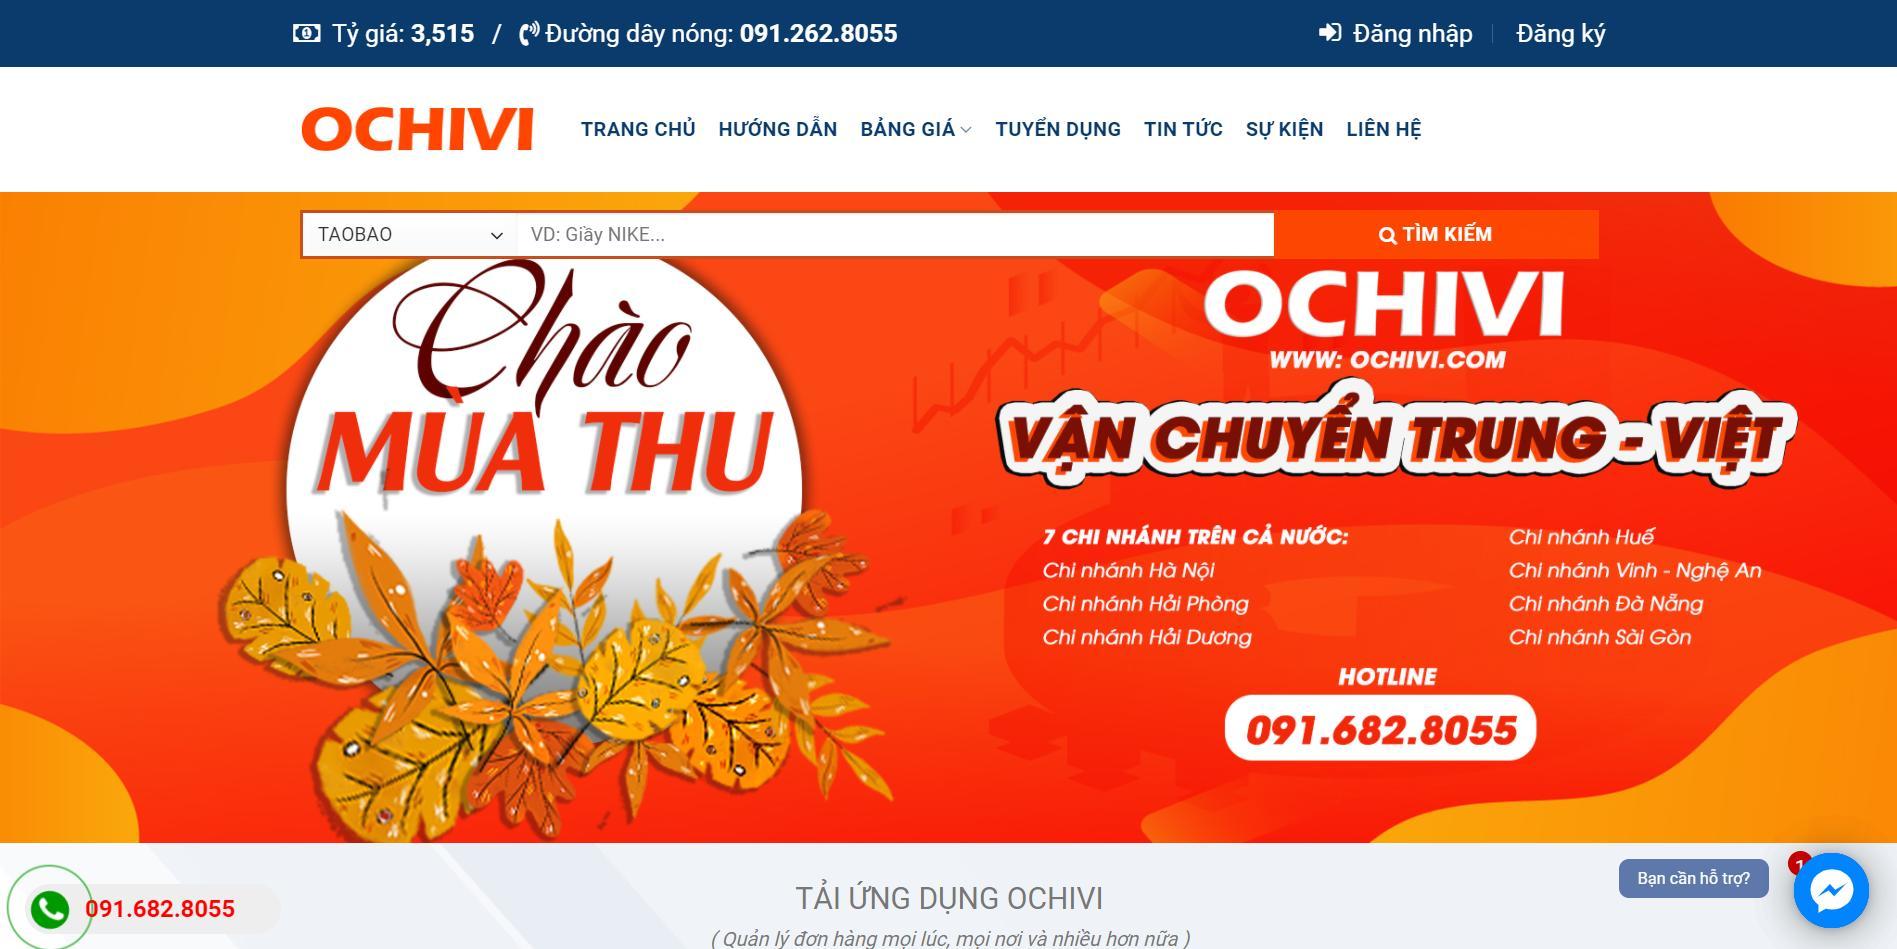 OCHIVI – Web order hàng trung quốc